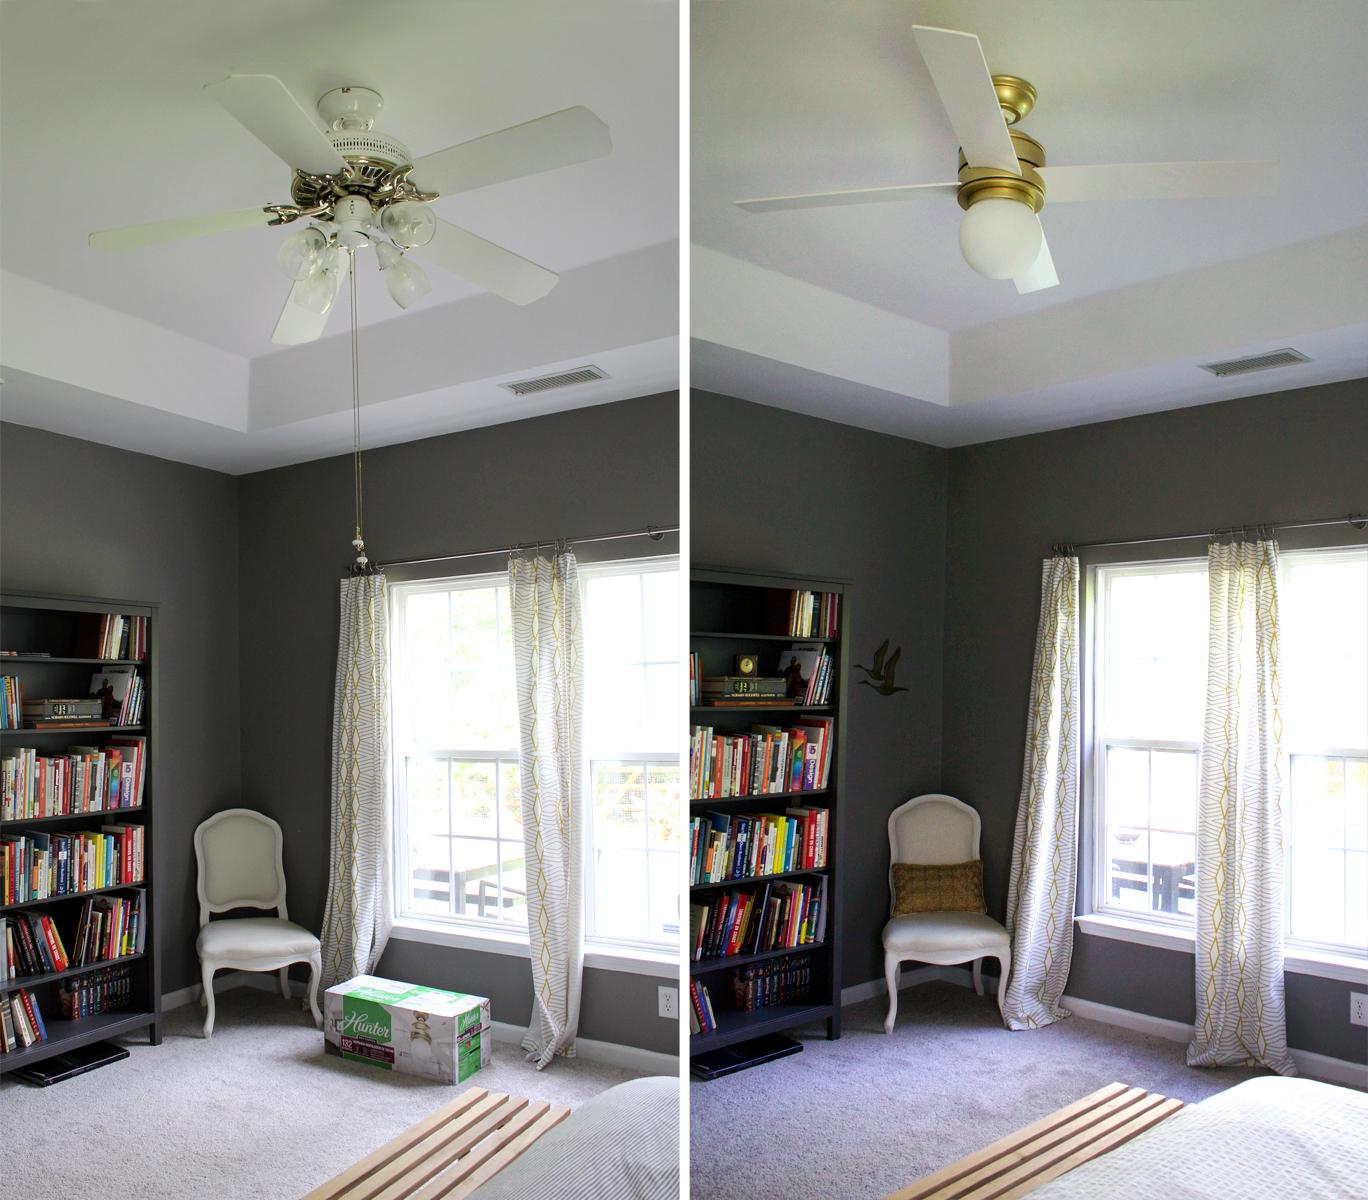 Hunter Fan Hepburn: a modern ceiling fan upgrade for under $200 | tag&tibby